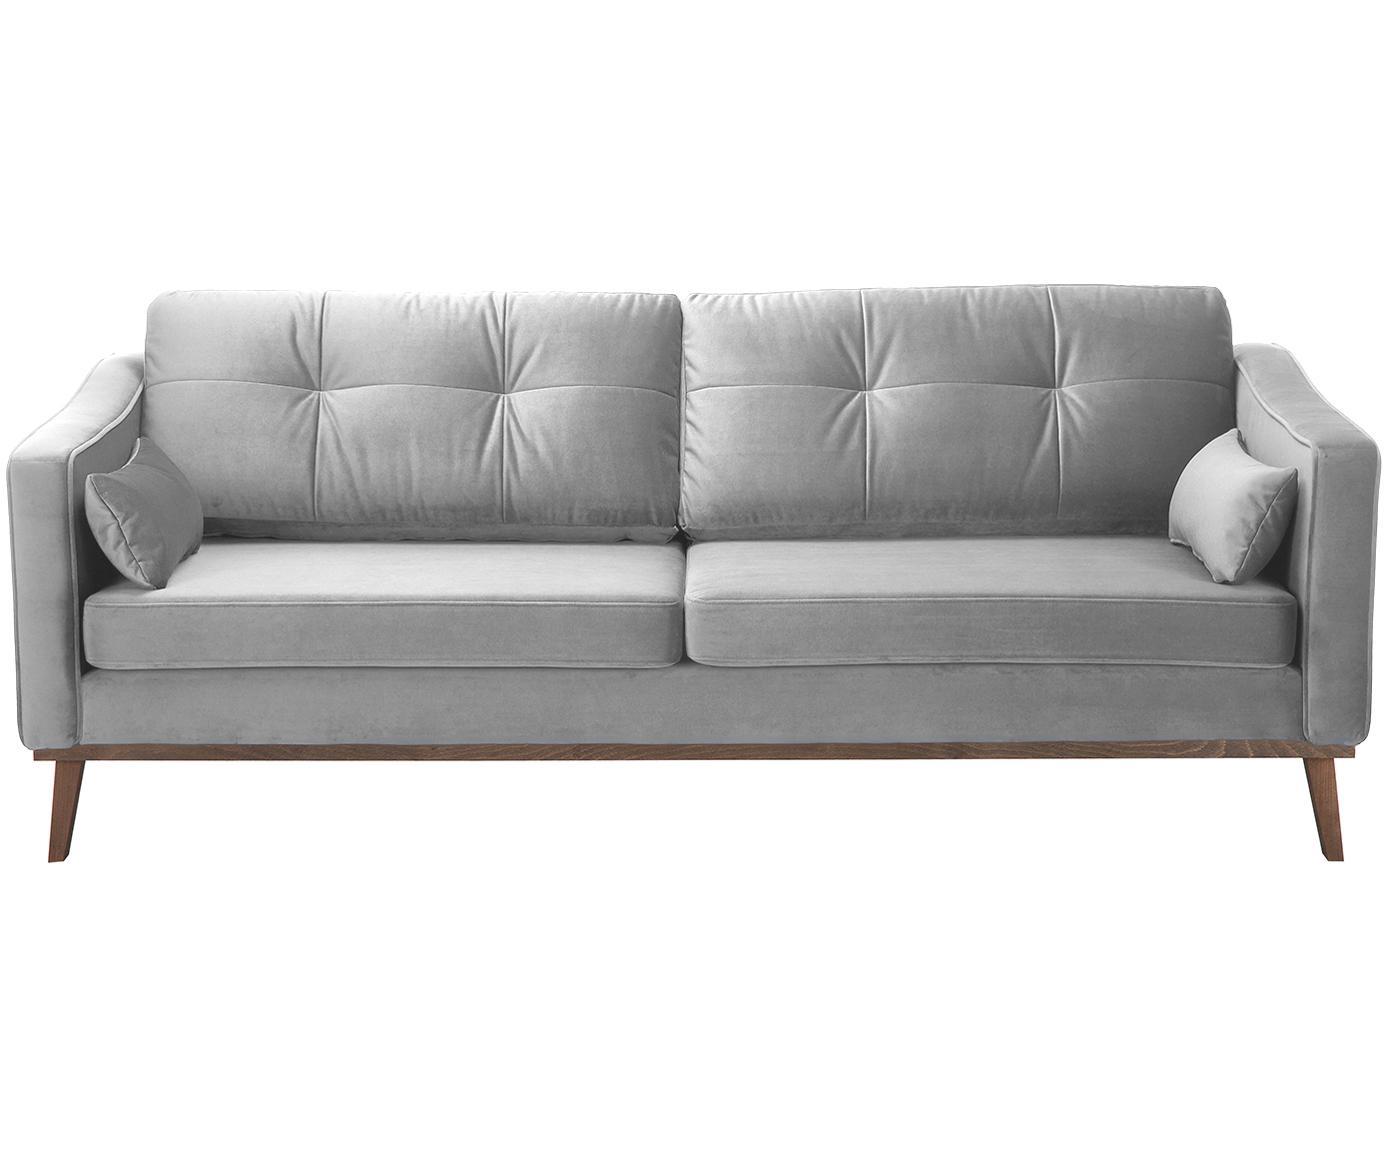 Samt-Sofa Alva (3-Sitzer), Bezug: Samt (Hochwertiger Polyes, Gestell: Massives Kiefernholz, Füße: Massives Buchenholz, gebe, Samt Grau, B 215 x T 92 cm